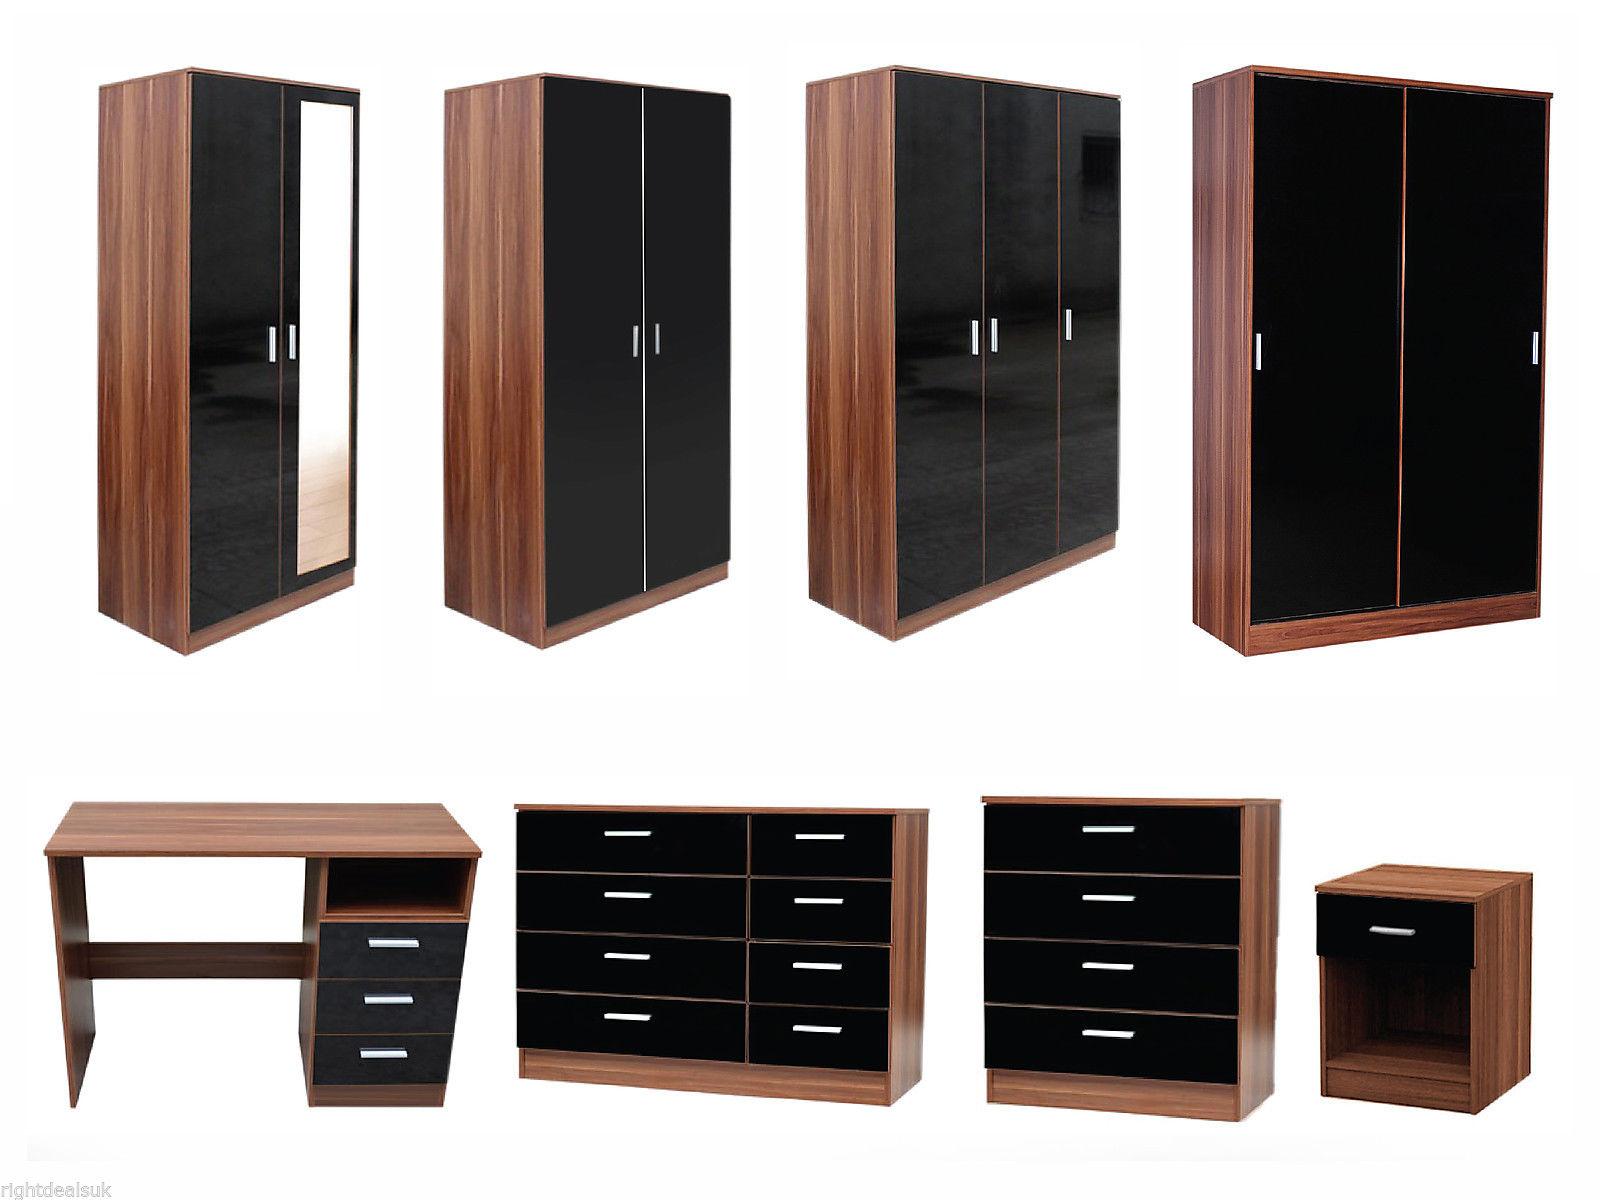 Chic Alpine High Gloss White Bedroom Furniture Best Ideas 2017 walnut black gloss bedroom furniture